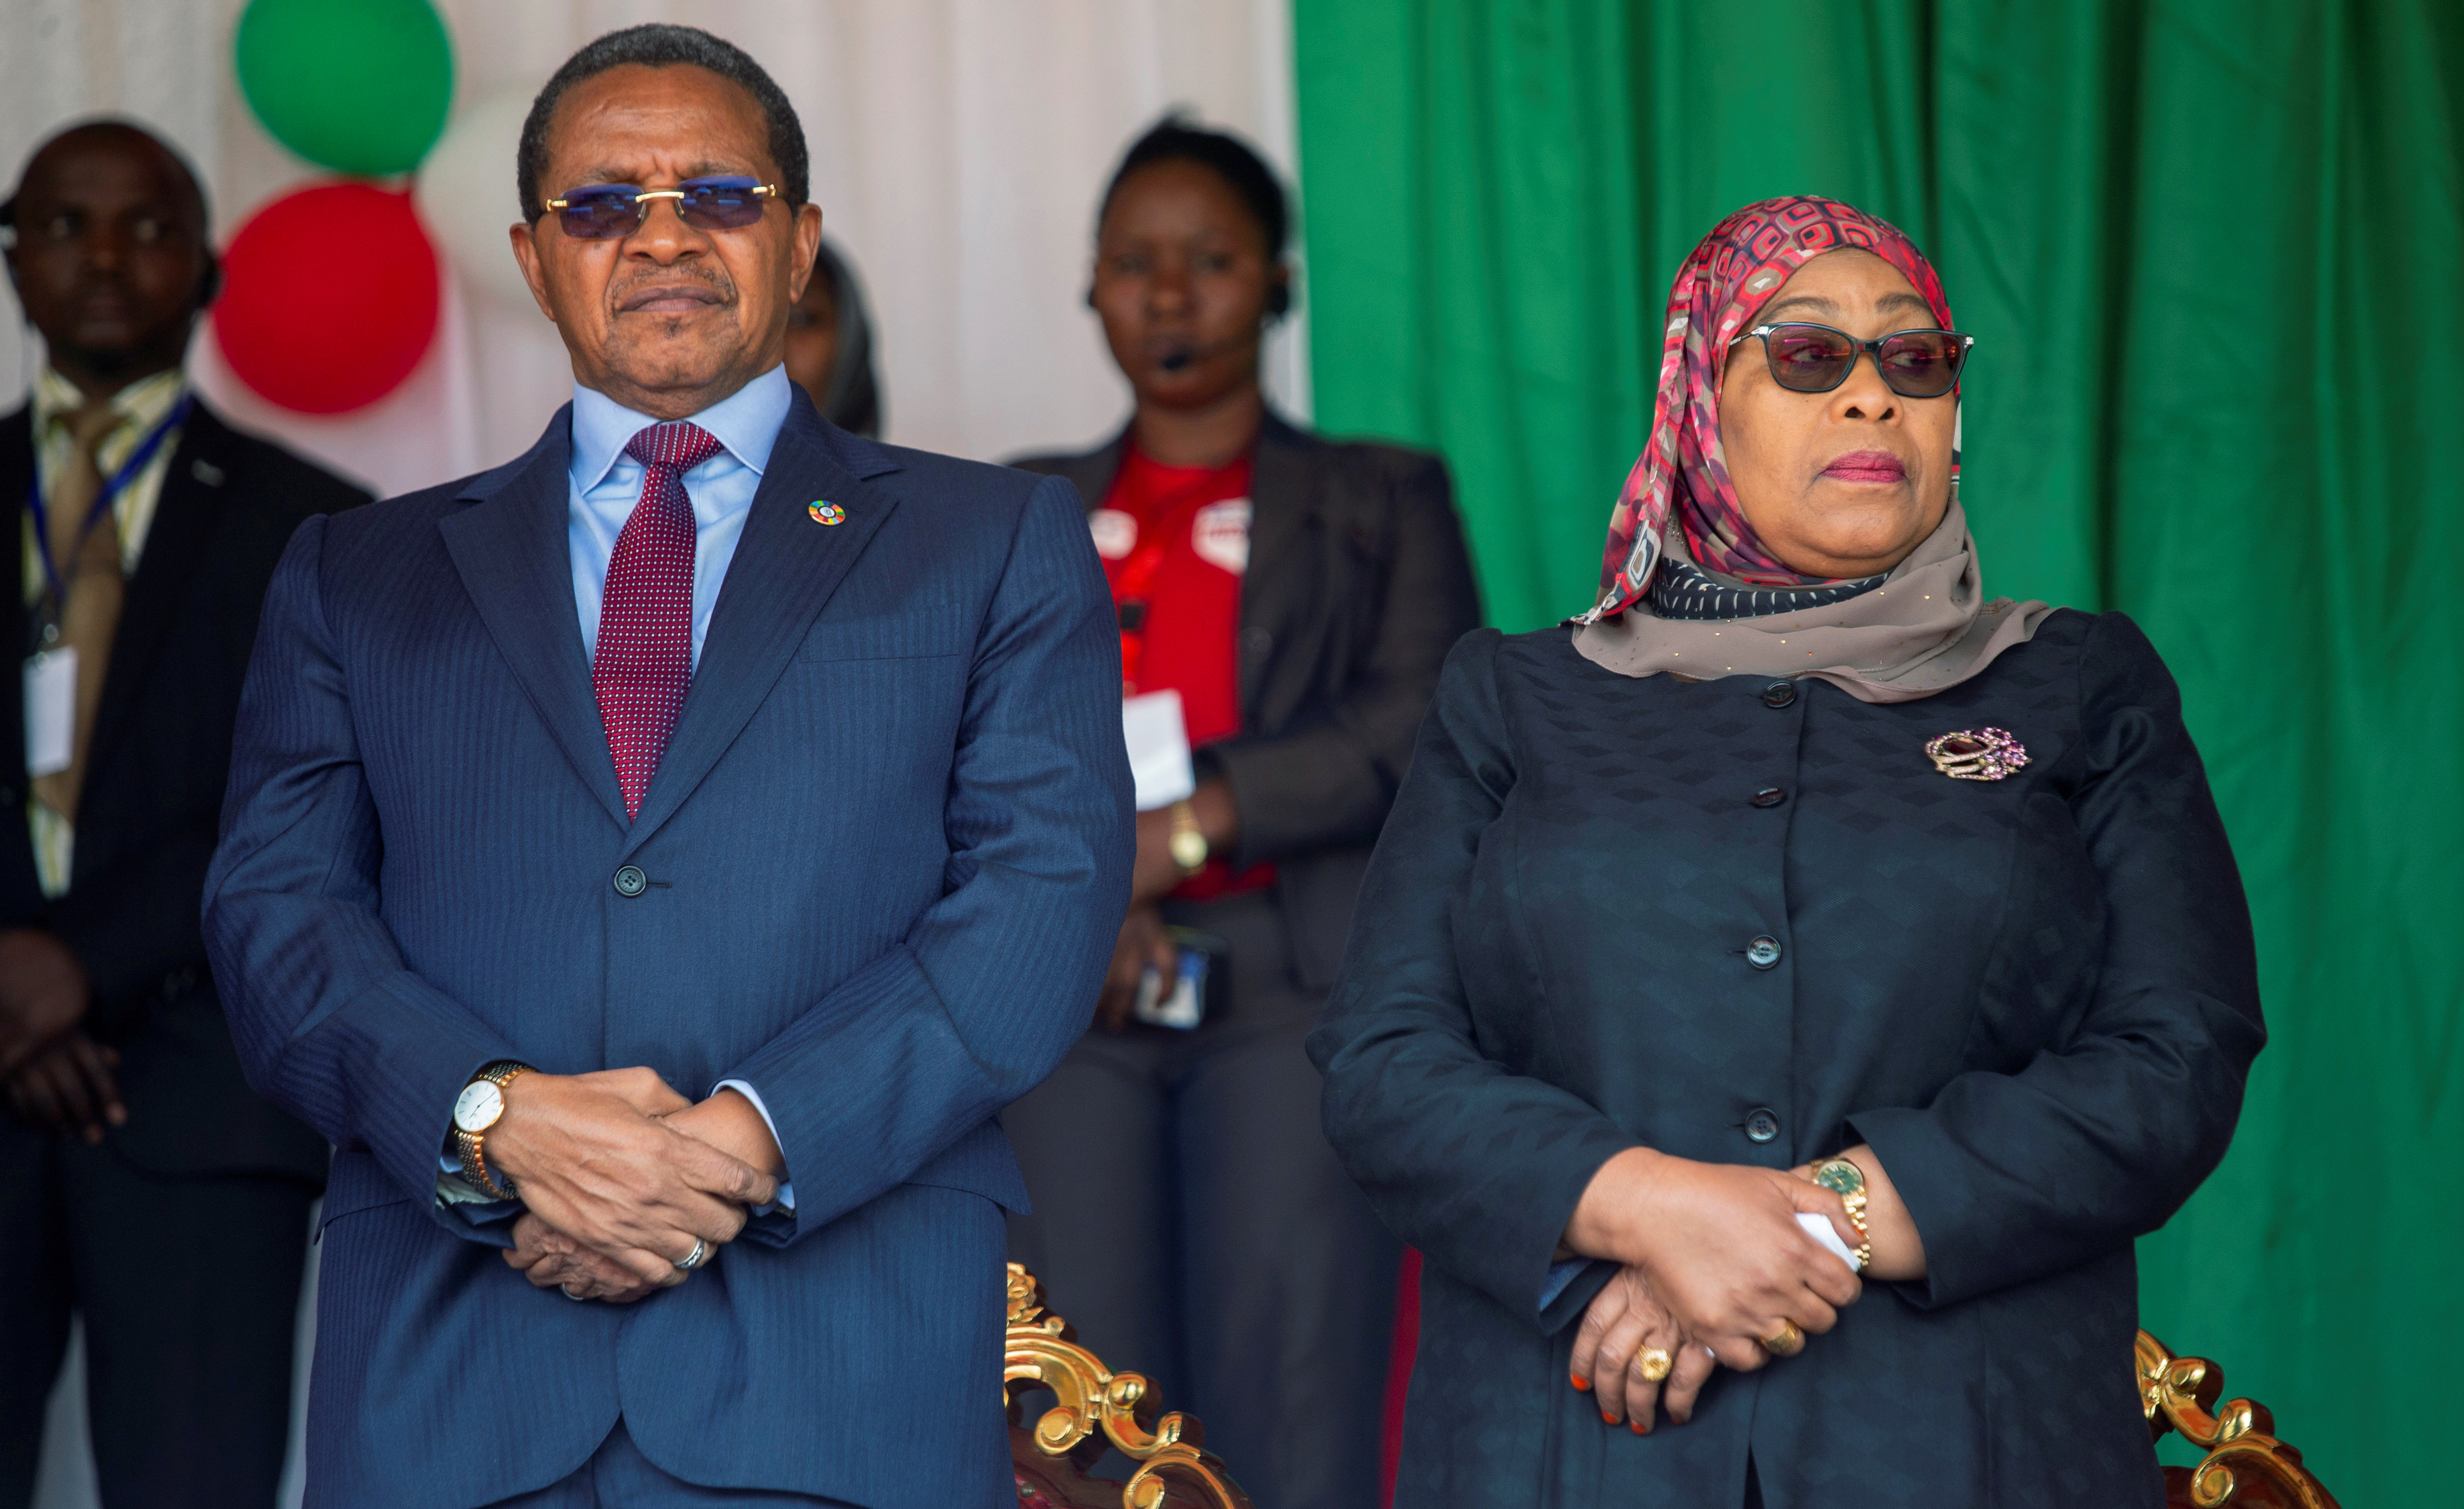 Former Tanzania's President Jakaya Kikwete and Tanzania's Vice President Samia Suluhu Hassan, at the Ingoma stadium in Gitega, Burundi June 18, 2020. REUTERS/Evrard Ngendakumana/File Photo